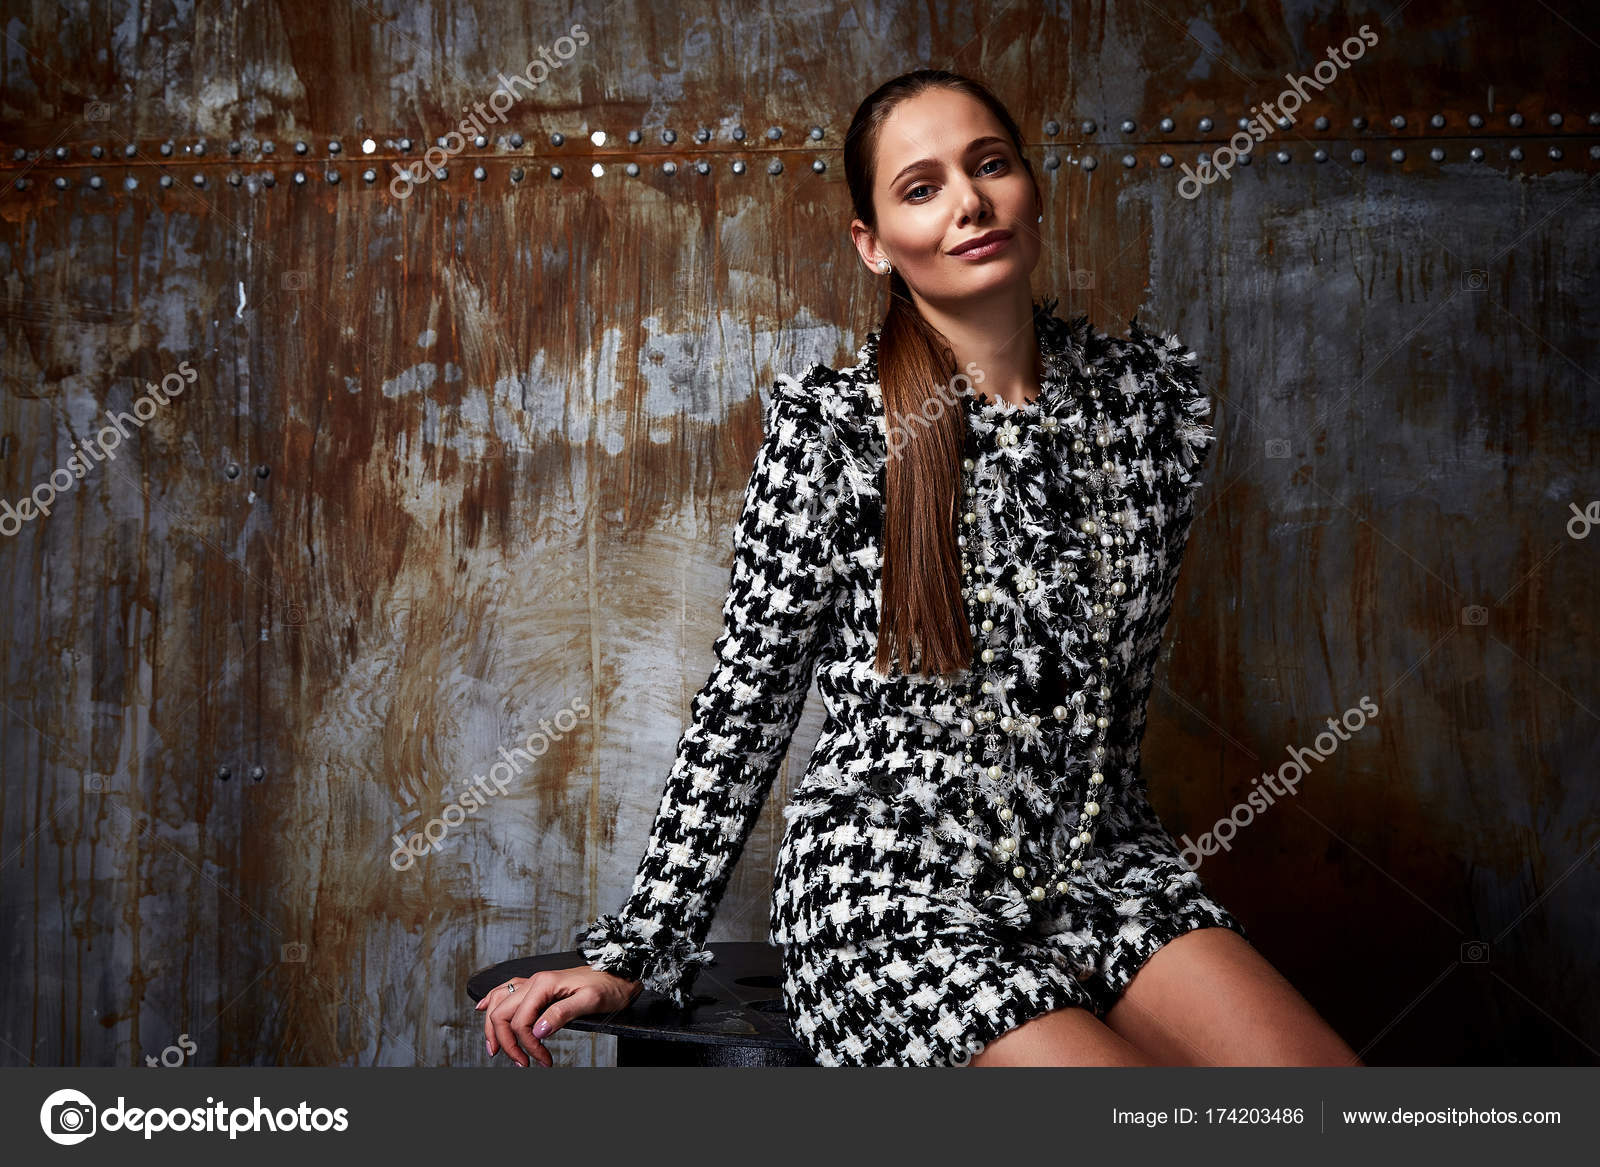 Moda Mujer Cuerpo Perfecto Forma Morena Peinar Vestir Sexy E